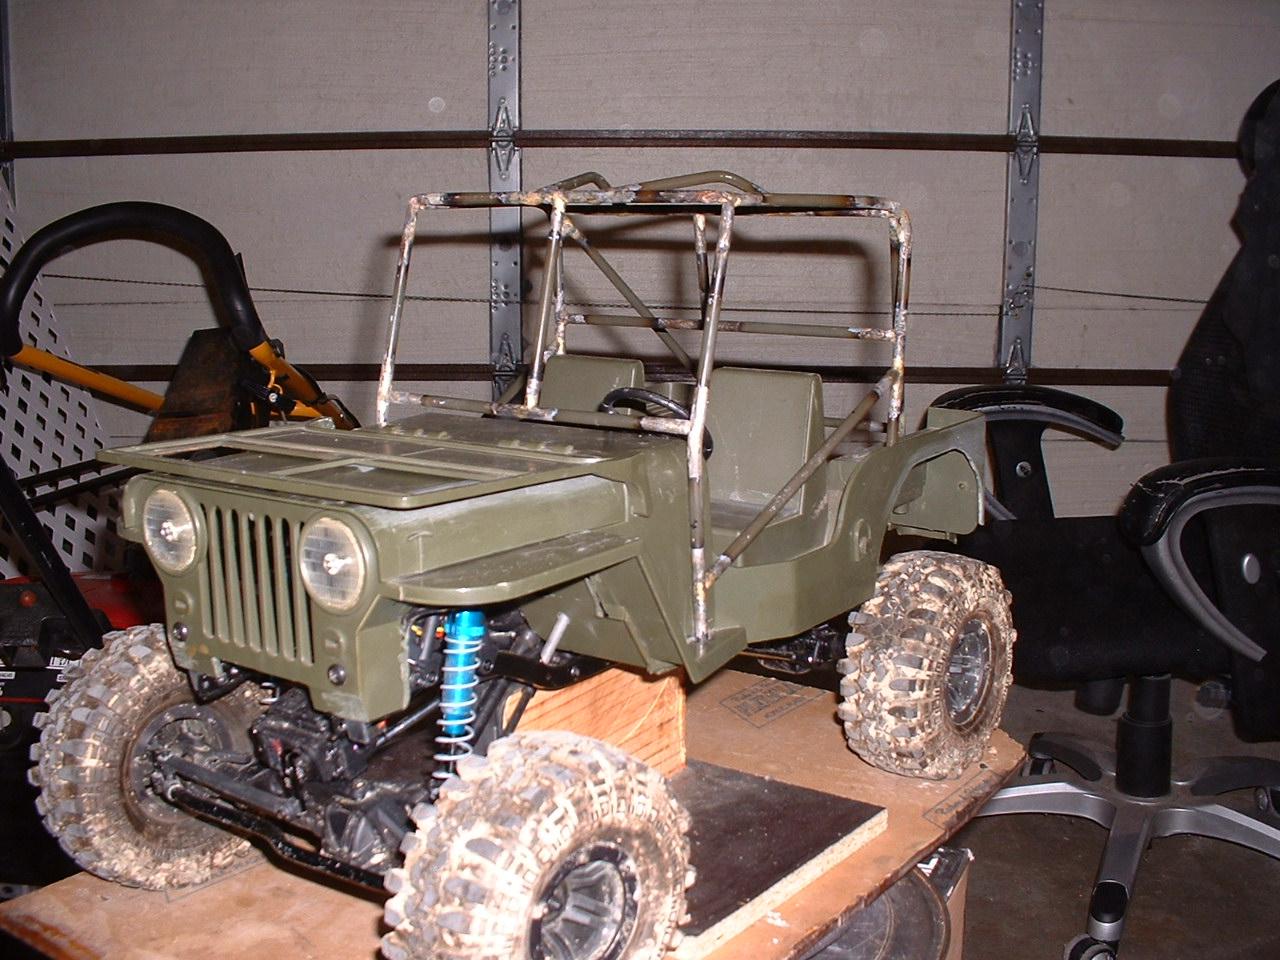 Click image for larger version  Name:GI Joe Jeep 6a 004.JPG Views:1427 Size:319.9 KB ID:2041222